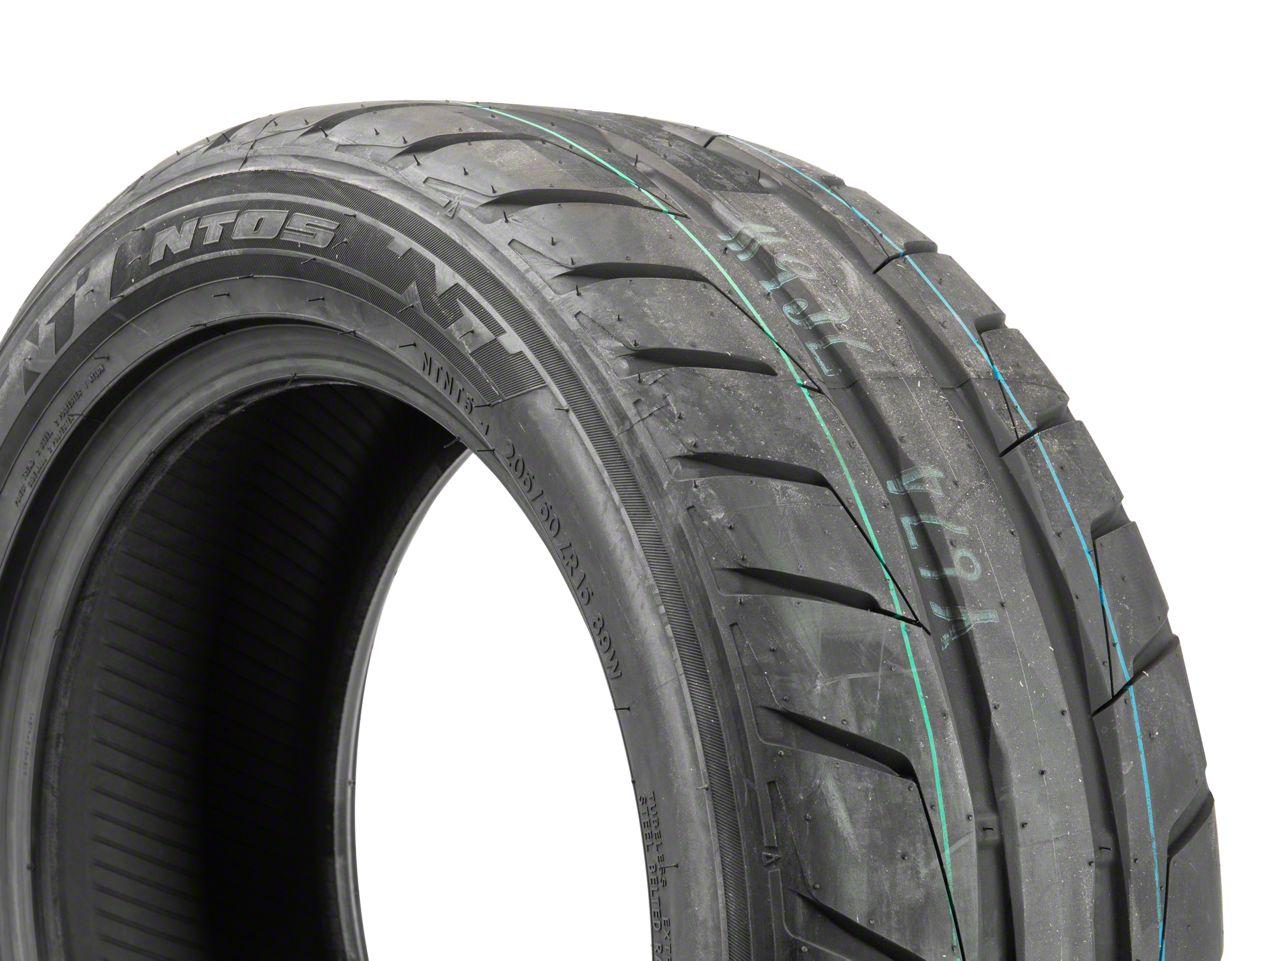 NITTO NT05 Max Performance Tire - 295/35R18